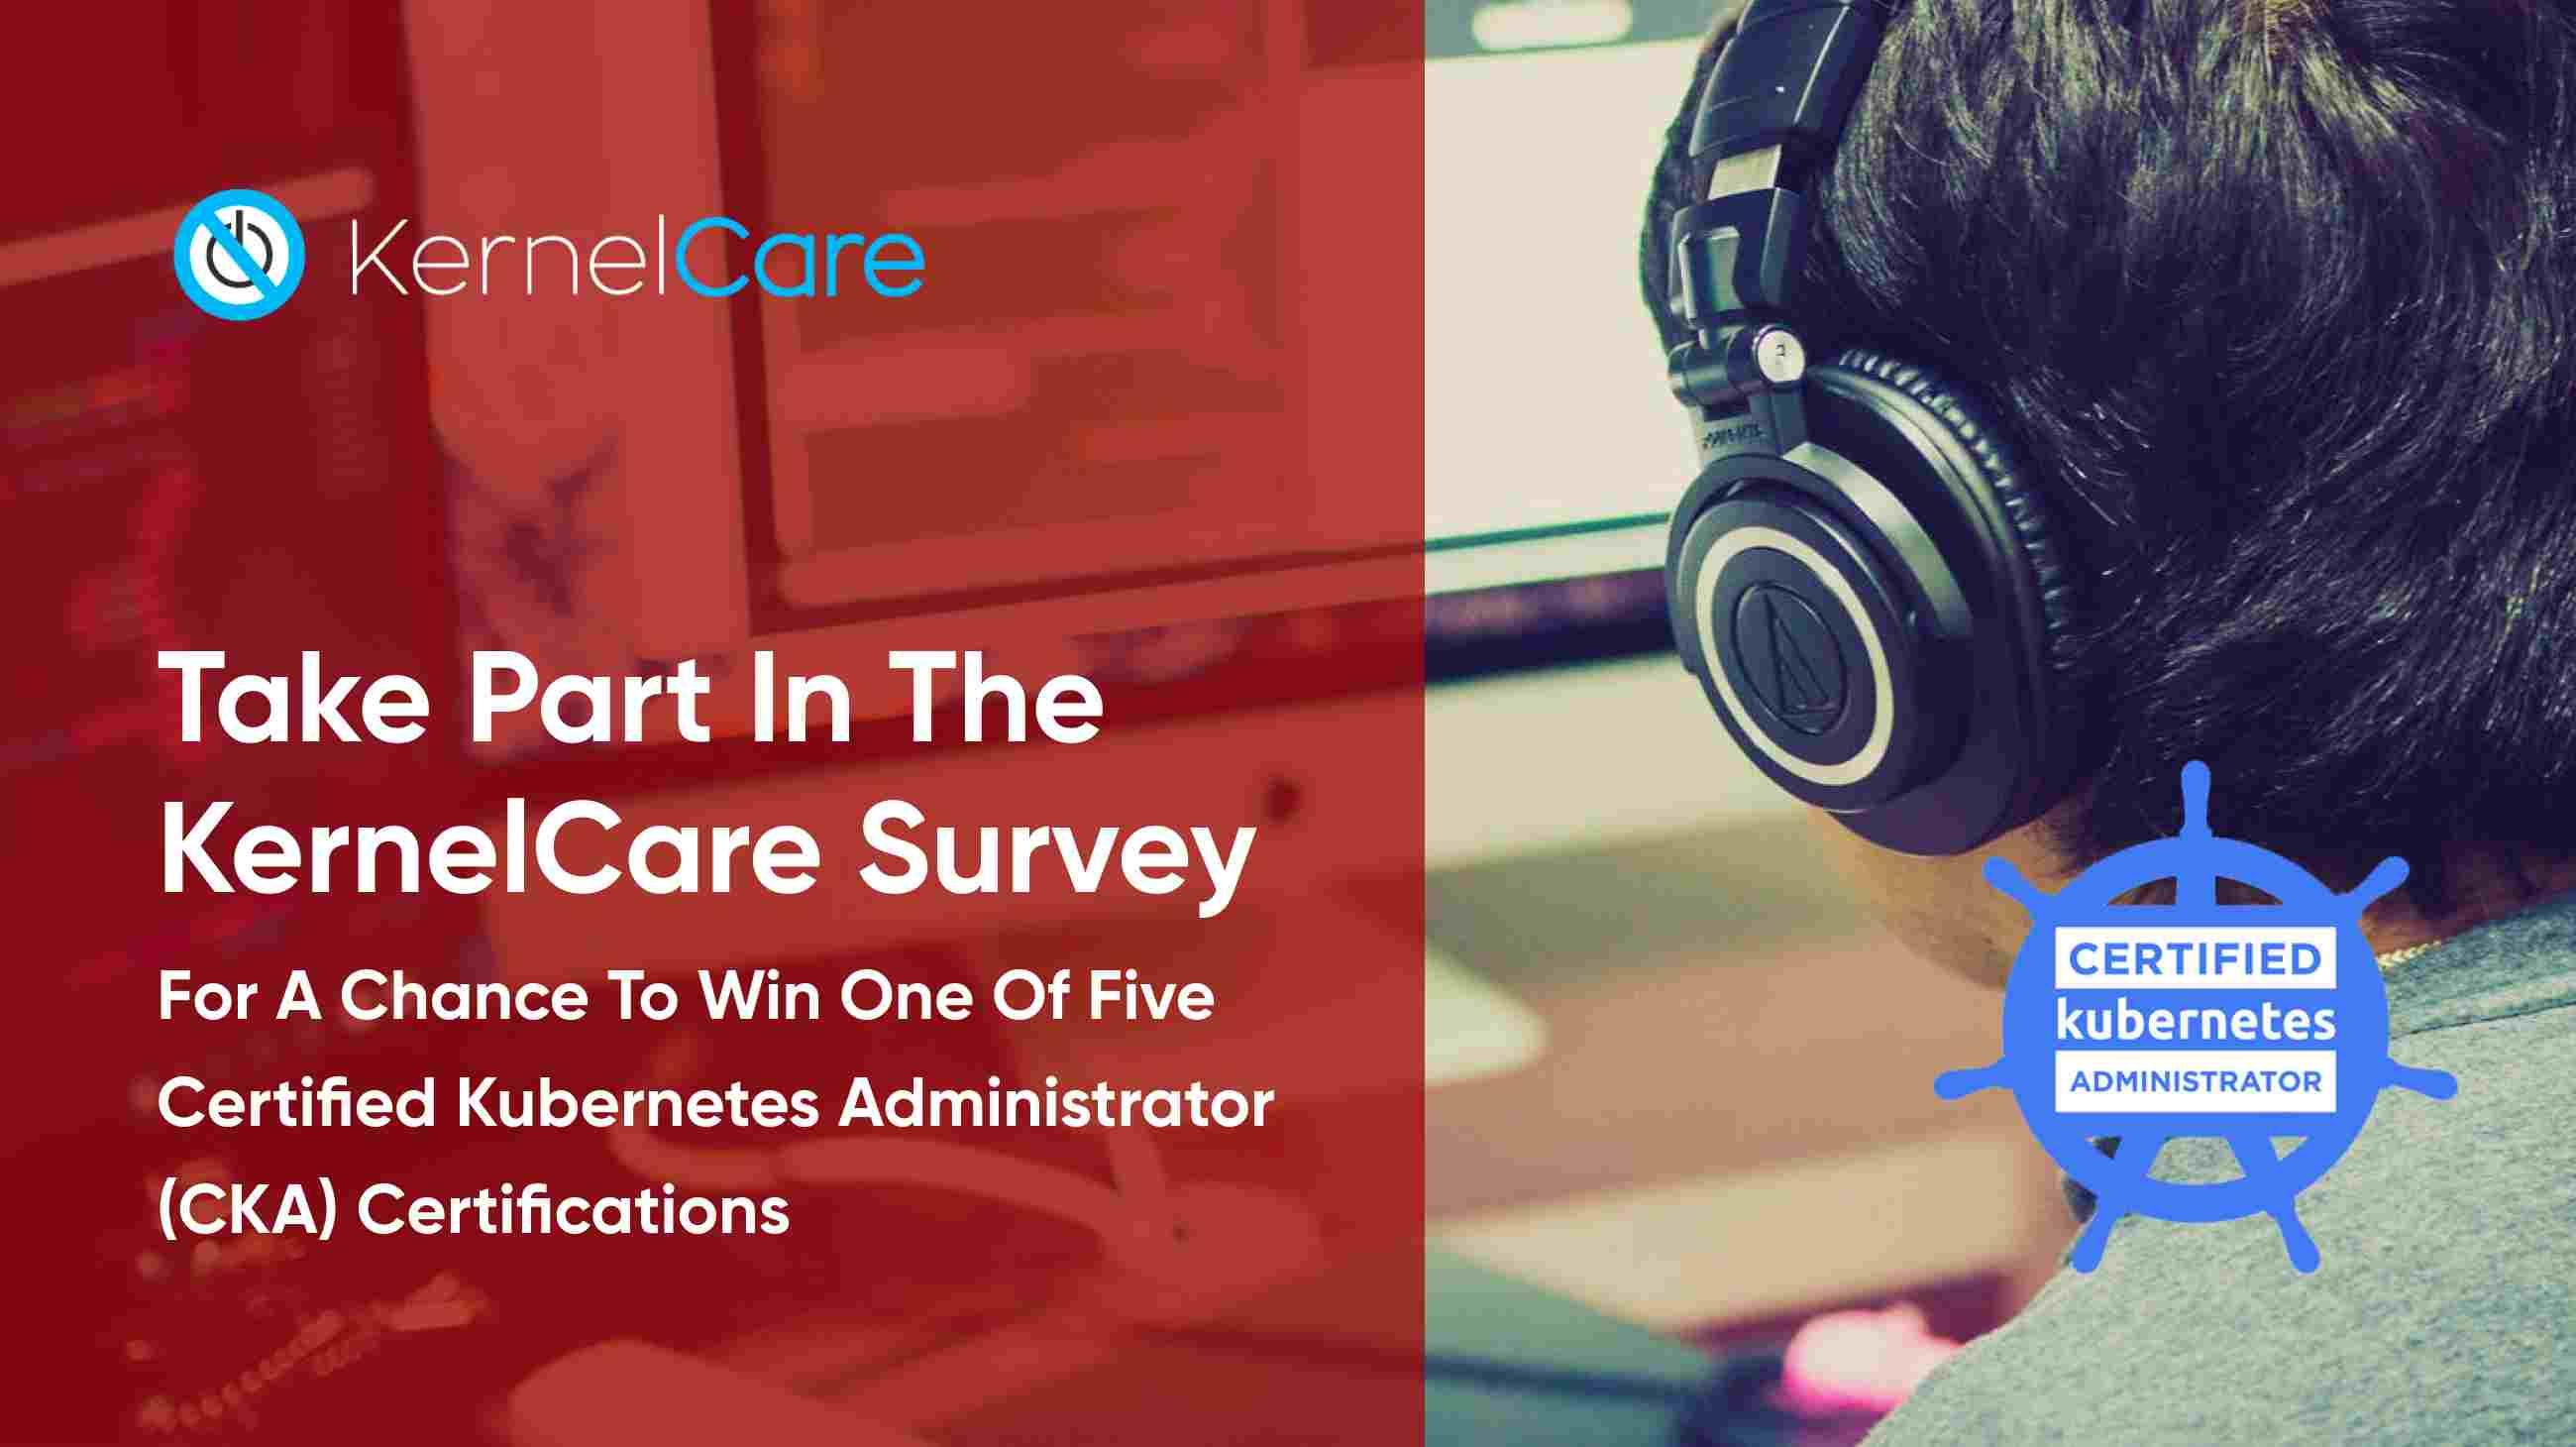 KernelCare survey